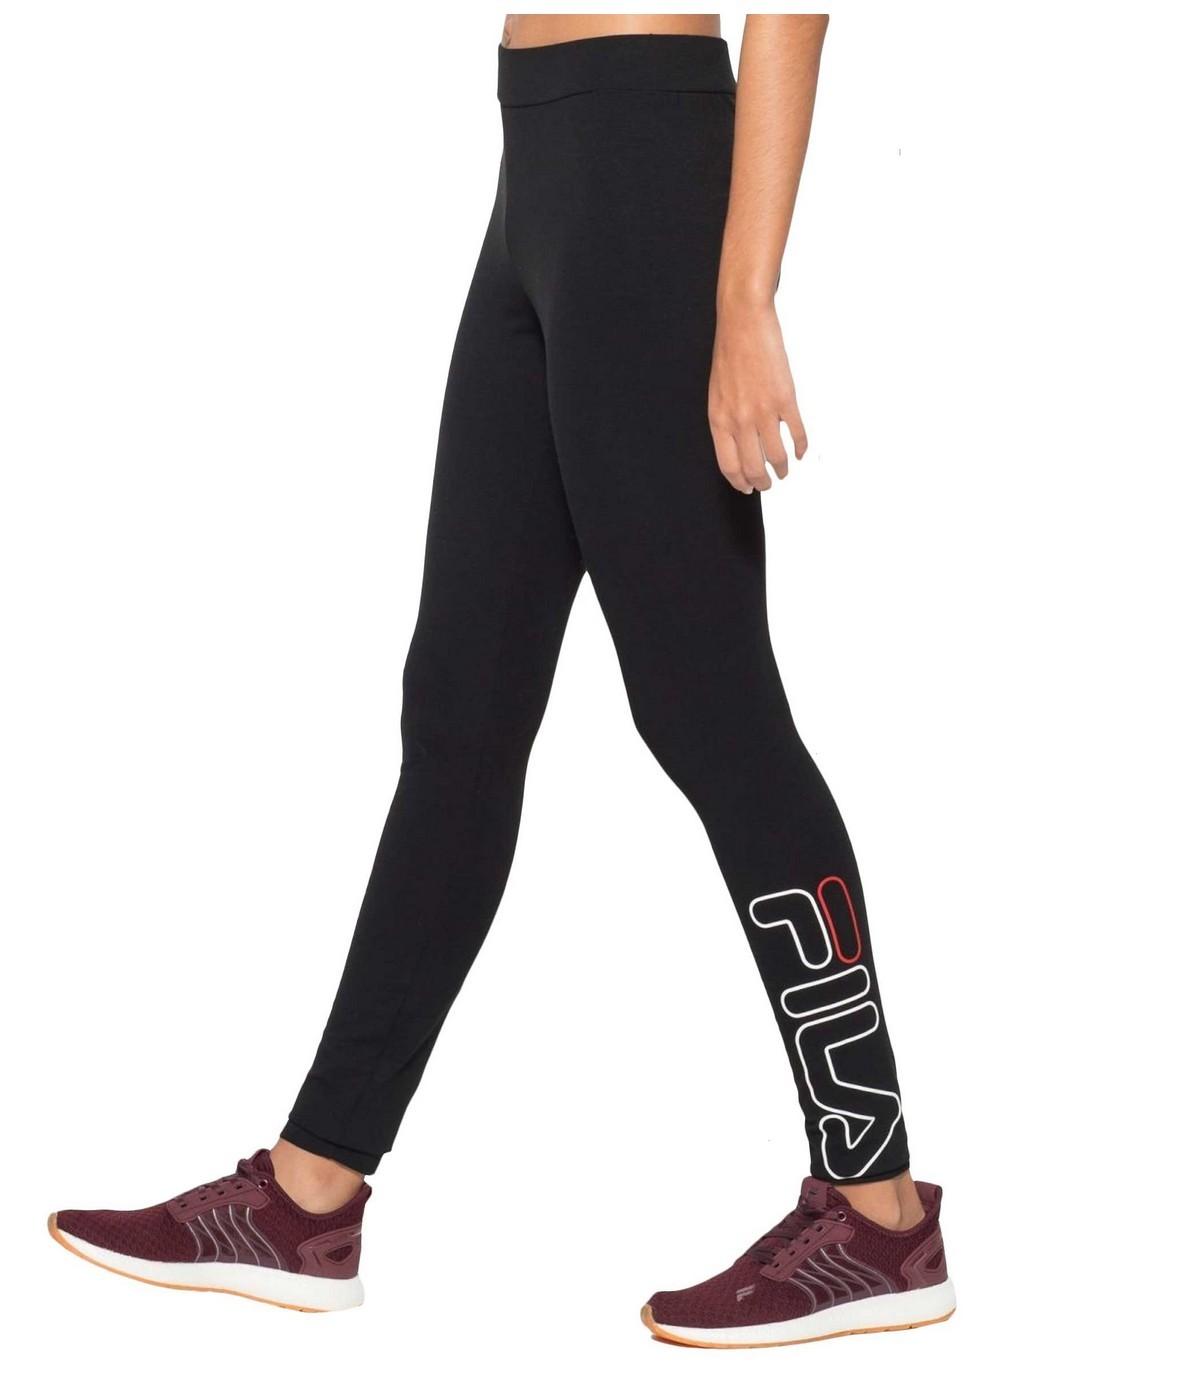 Fila 2 Flex Legging Femme 5 NoirShowroomvip Yyb67fgvI